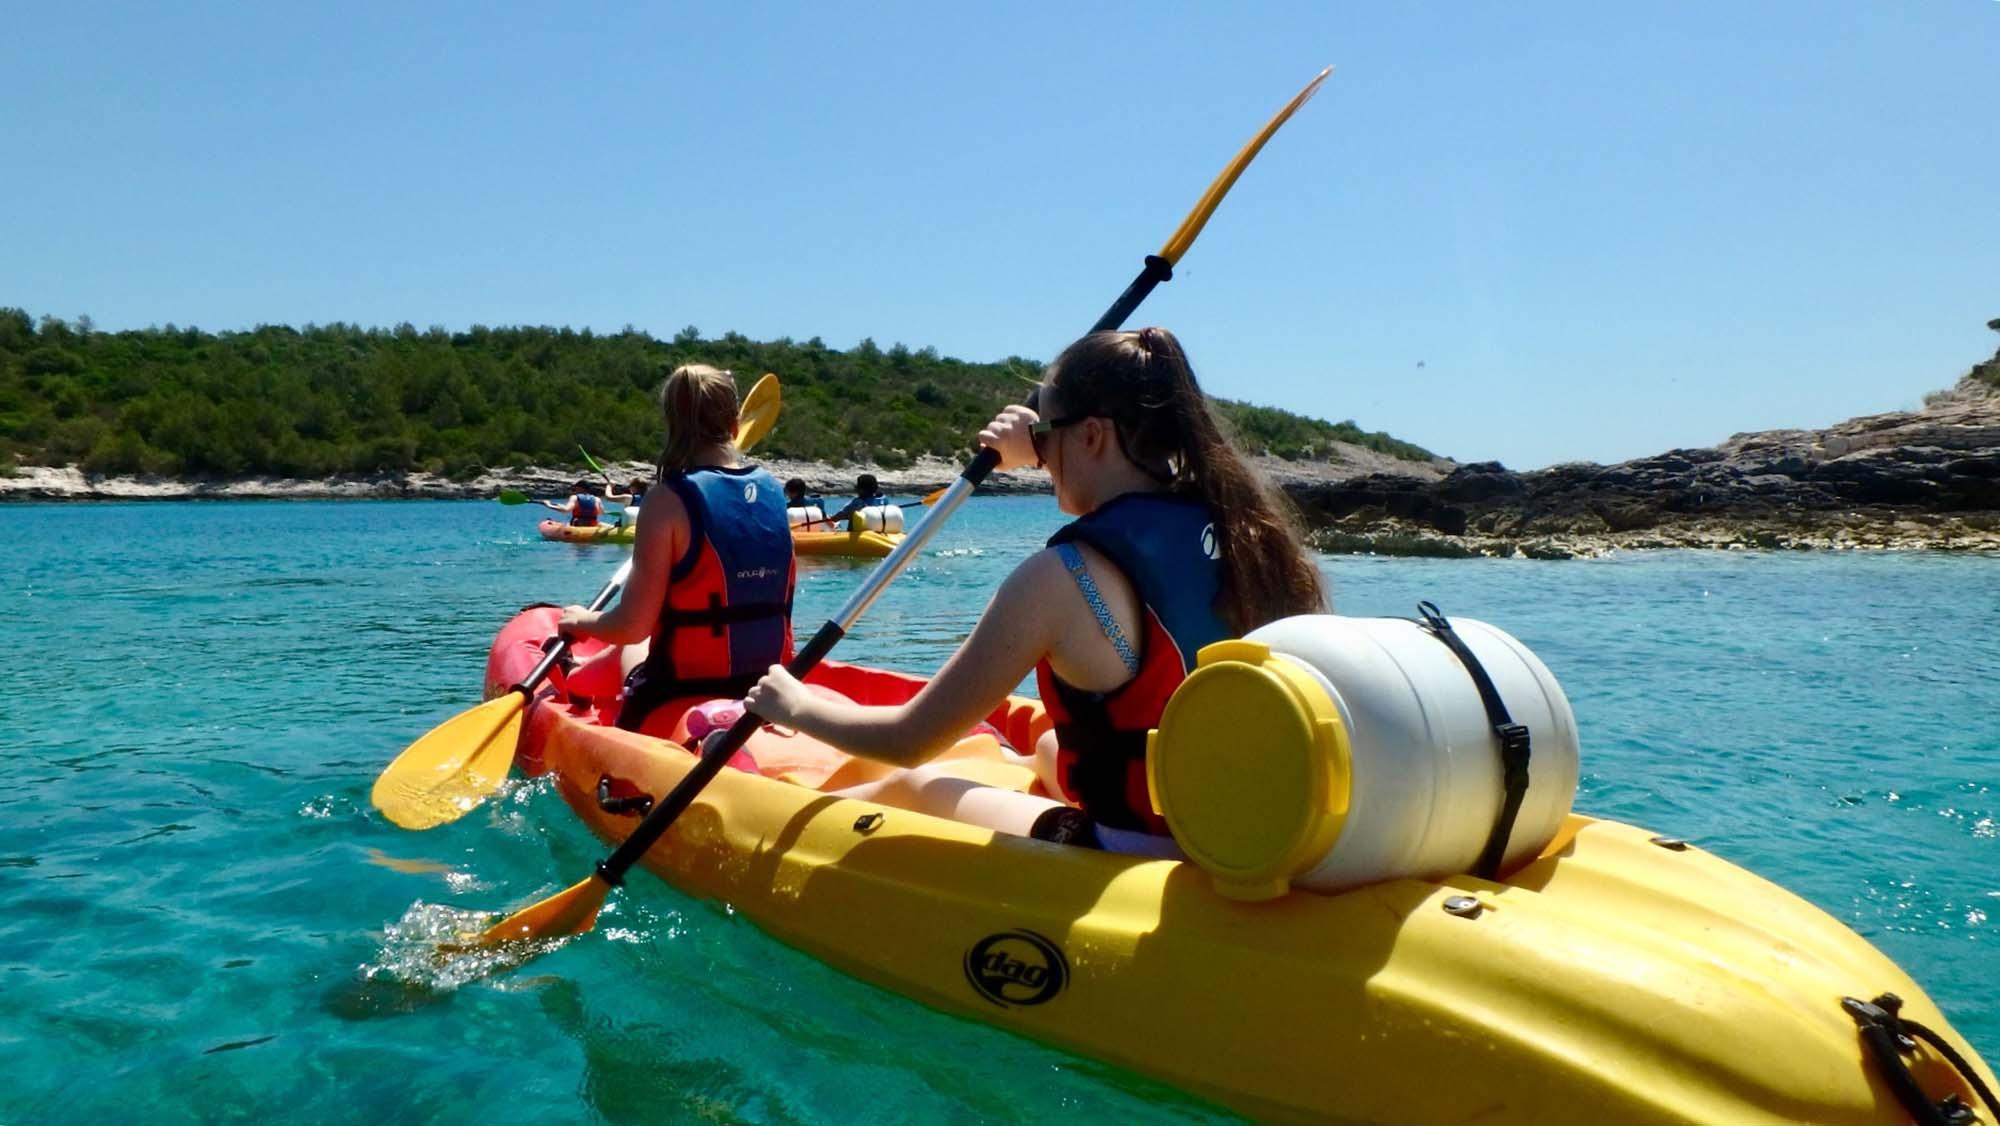 School Croatian kayak trip